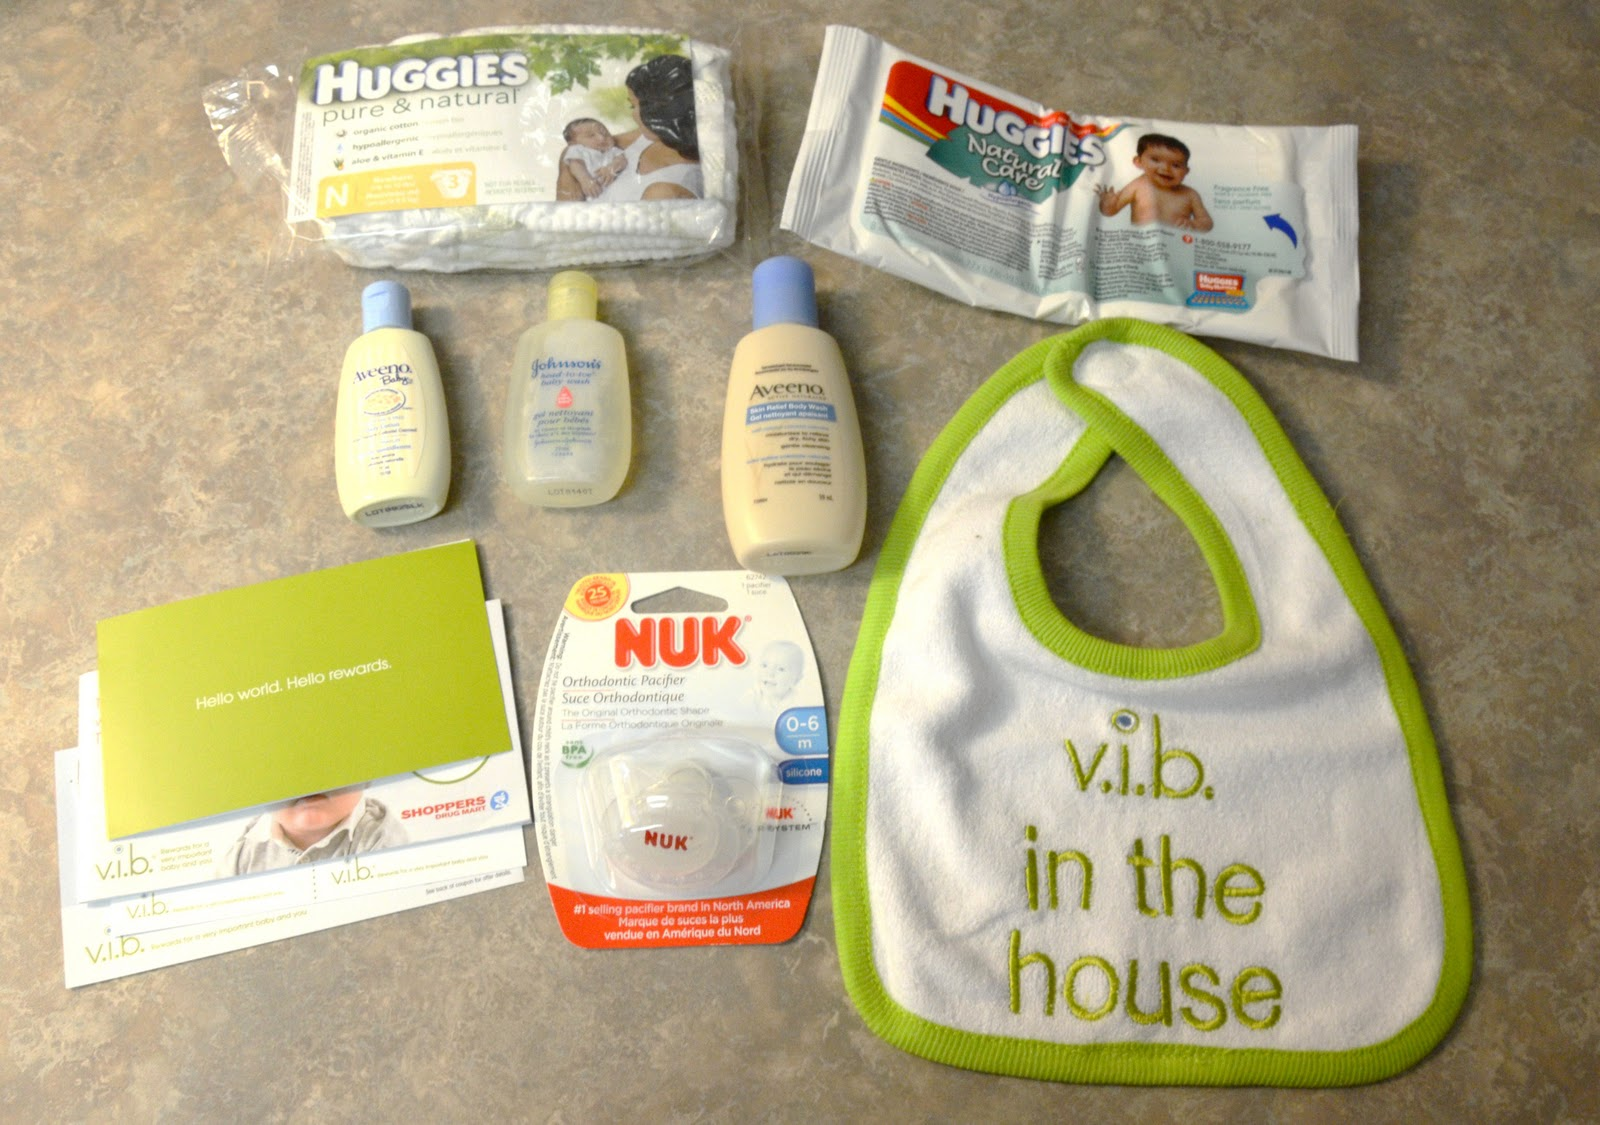 price d less free baby samples